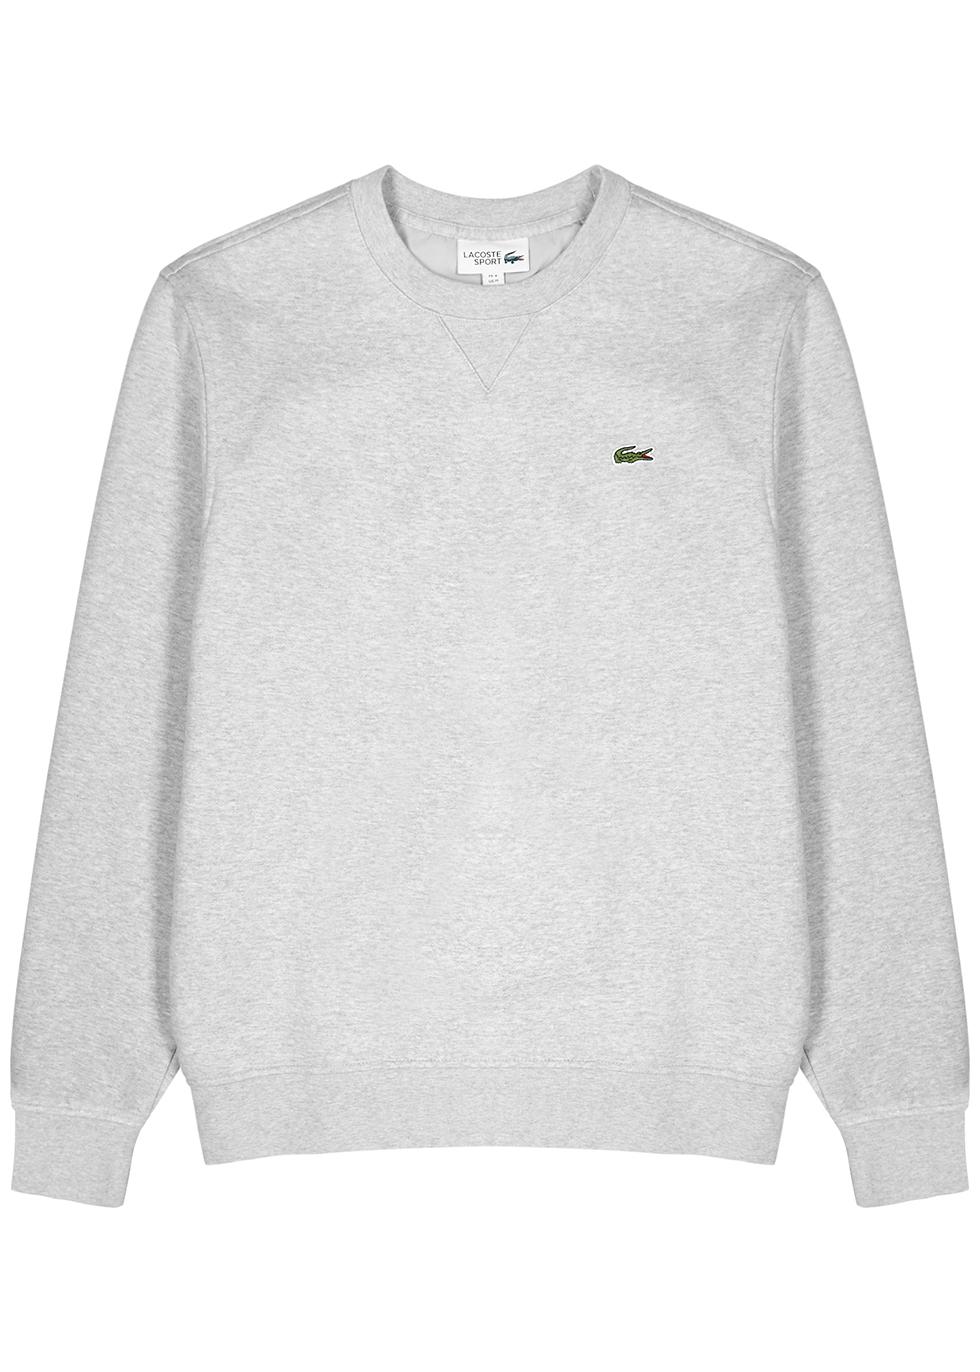 Light grey cotton-blend sweatshirt